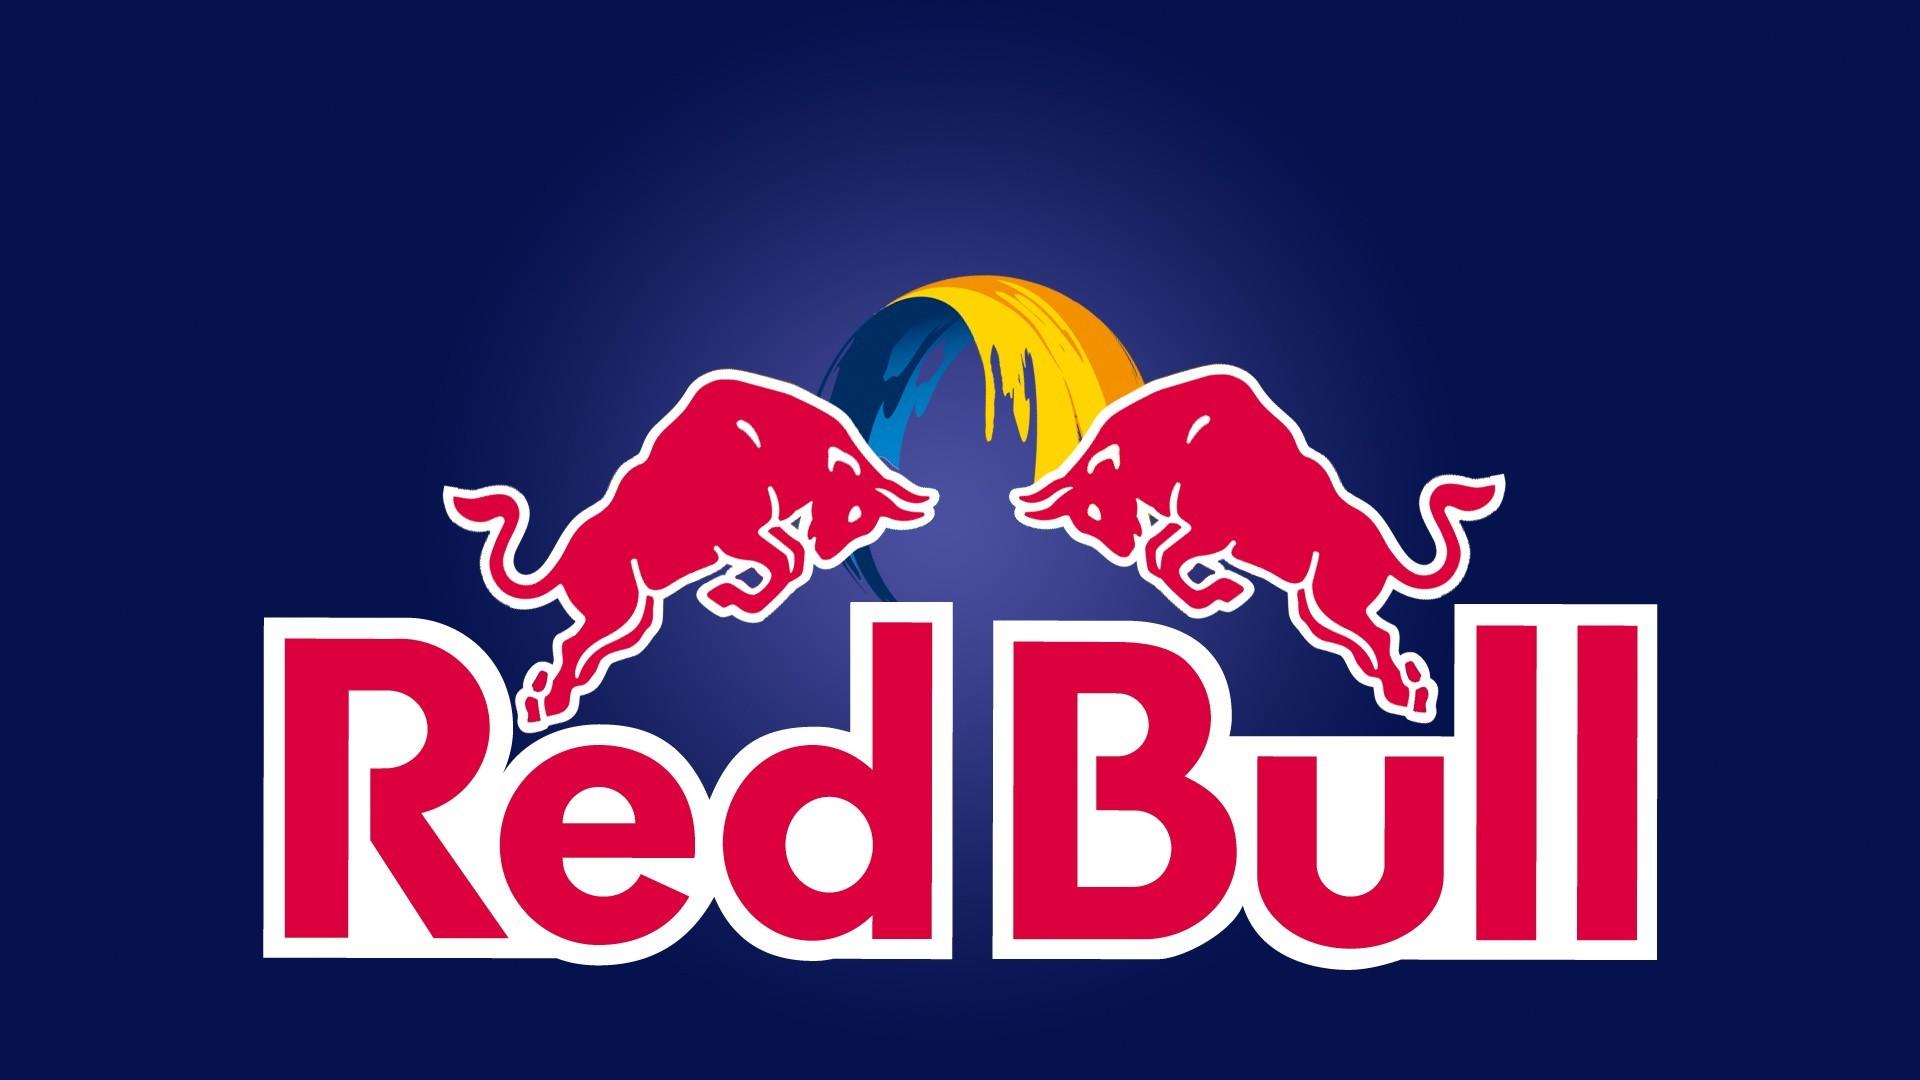 Seahawks Hd Wallpaper Red Bull Logo Wallpaper 60 Images